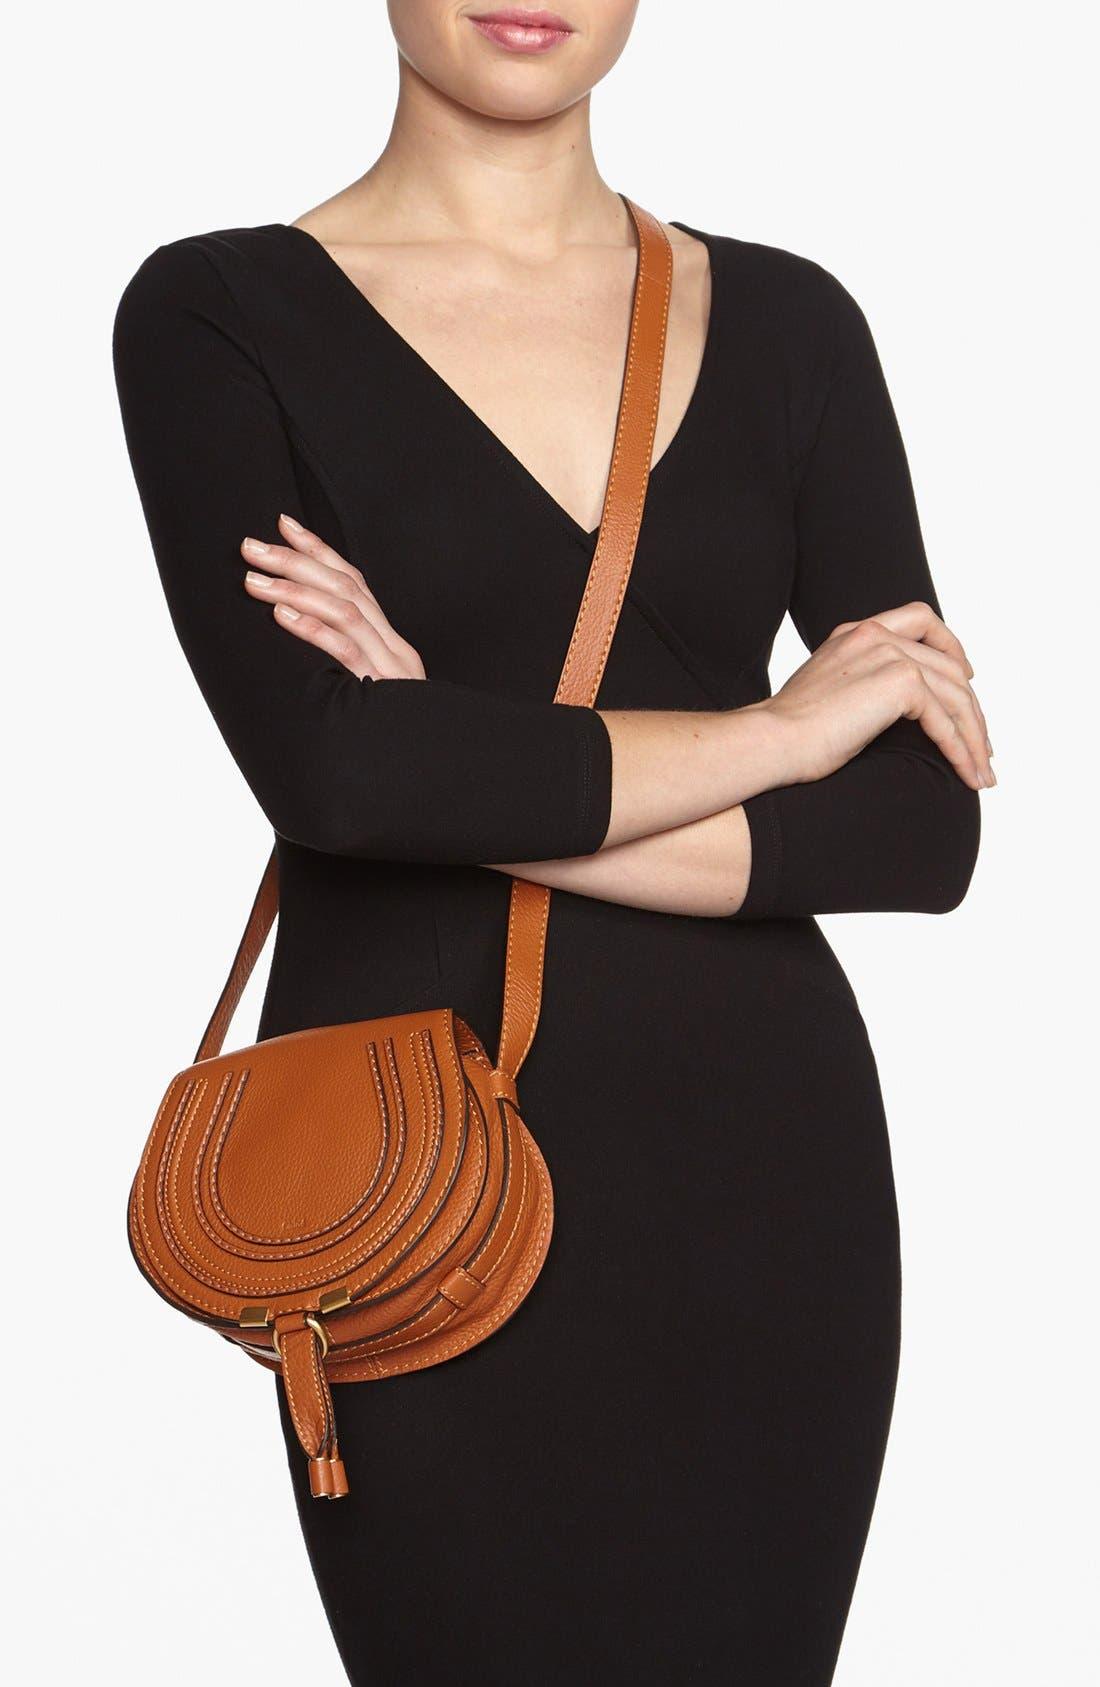 CHLOÉ, 'Mini Marcie' Leather Crossbody Bag, Alternate thumbnail 2, color, TAN GOLD HRDWRE